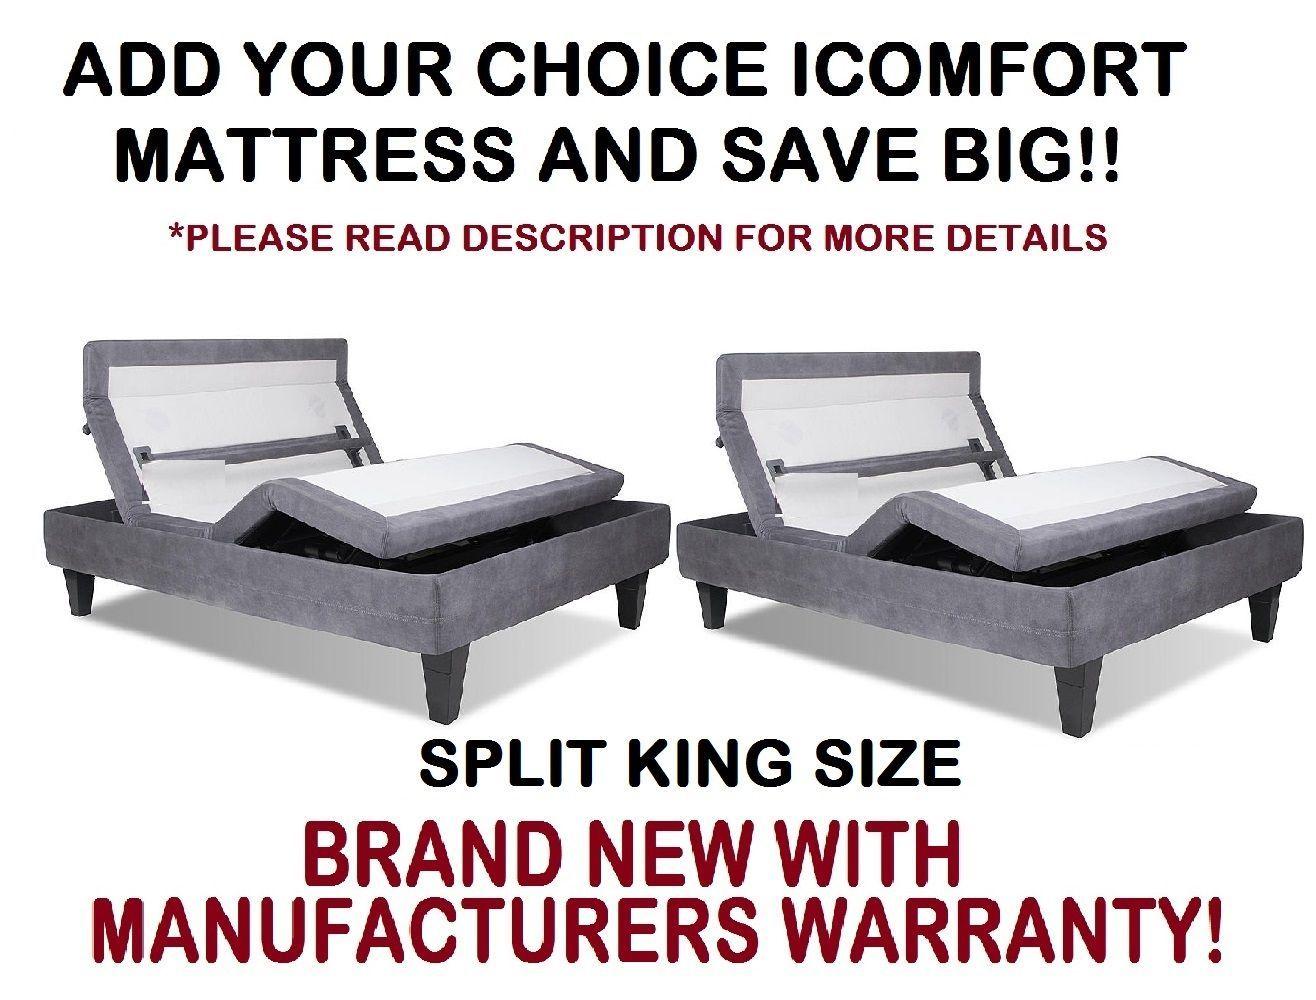 Serta Adjustable Bed Frame Parts : Serta icomfort split king size motion custom and